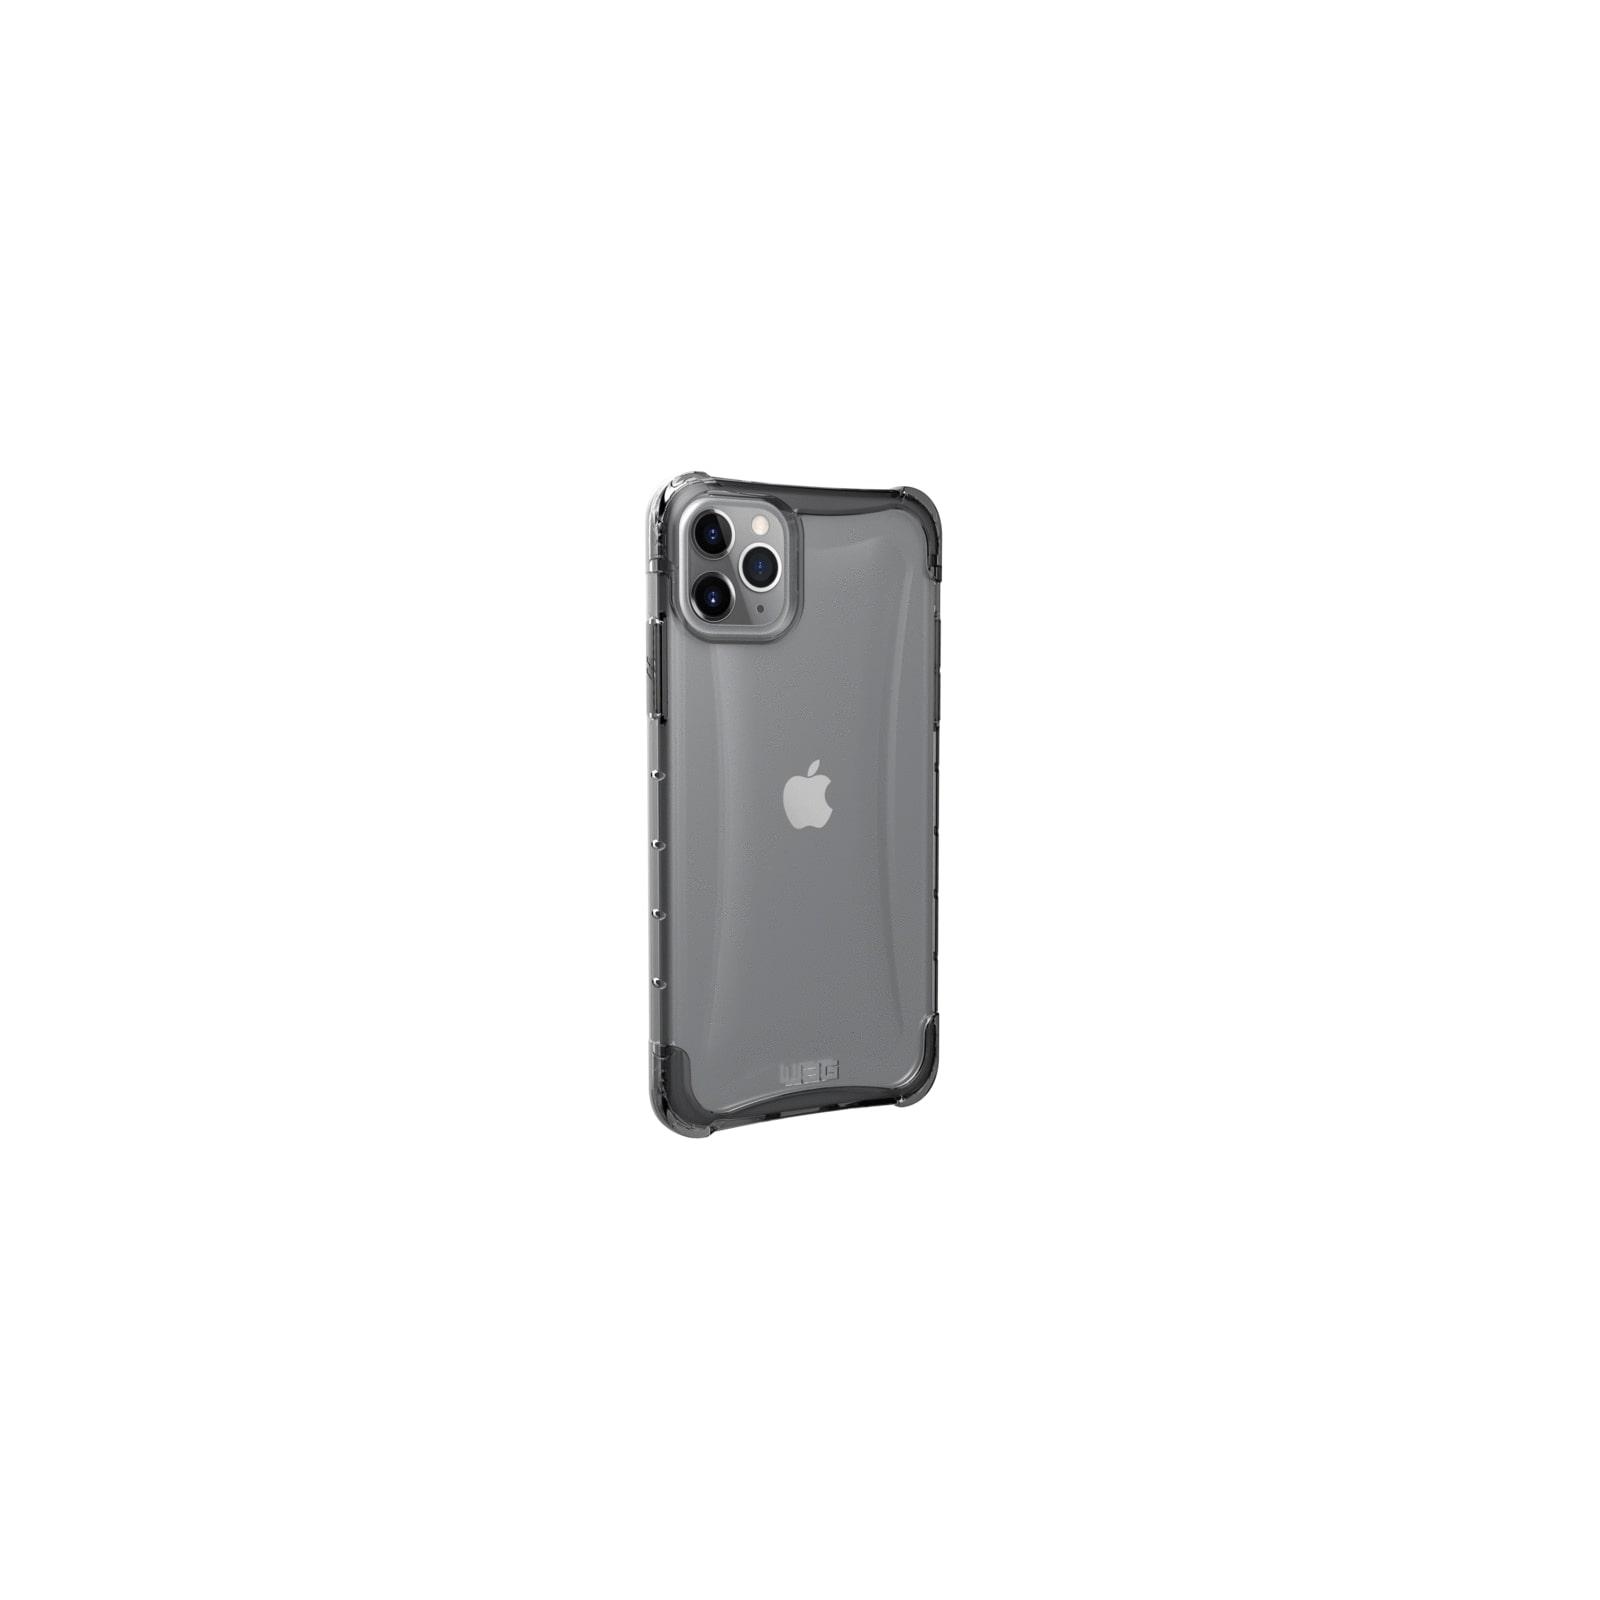 Чехол для моб. телефона Uag iPhone 11 Pro Max Plyo, Ice (111722114343) изображение 3